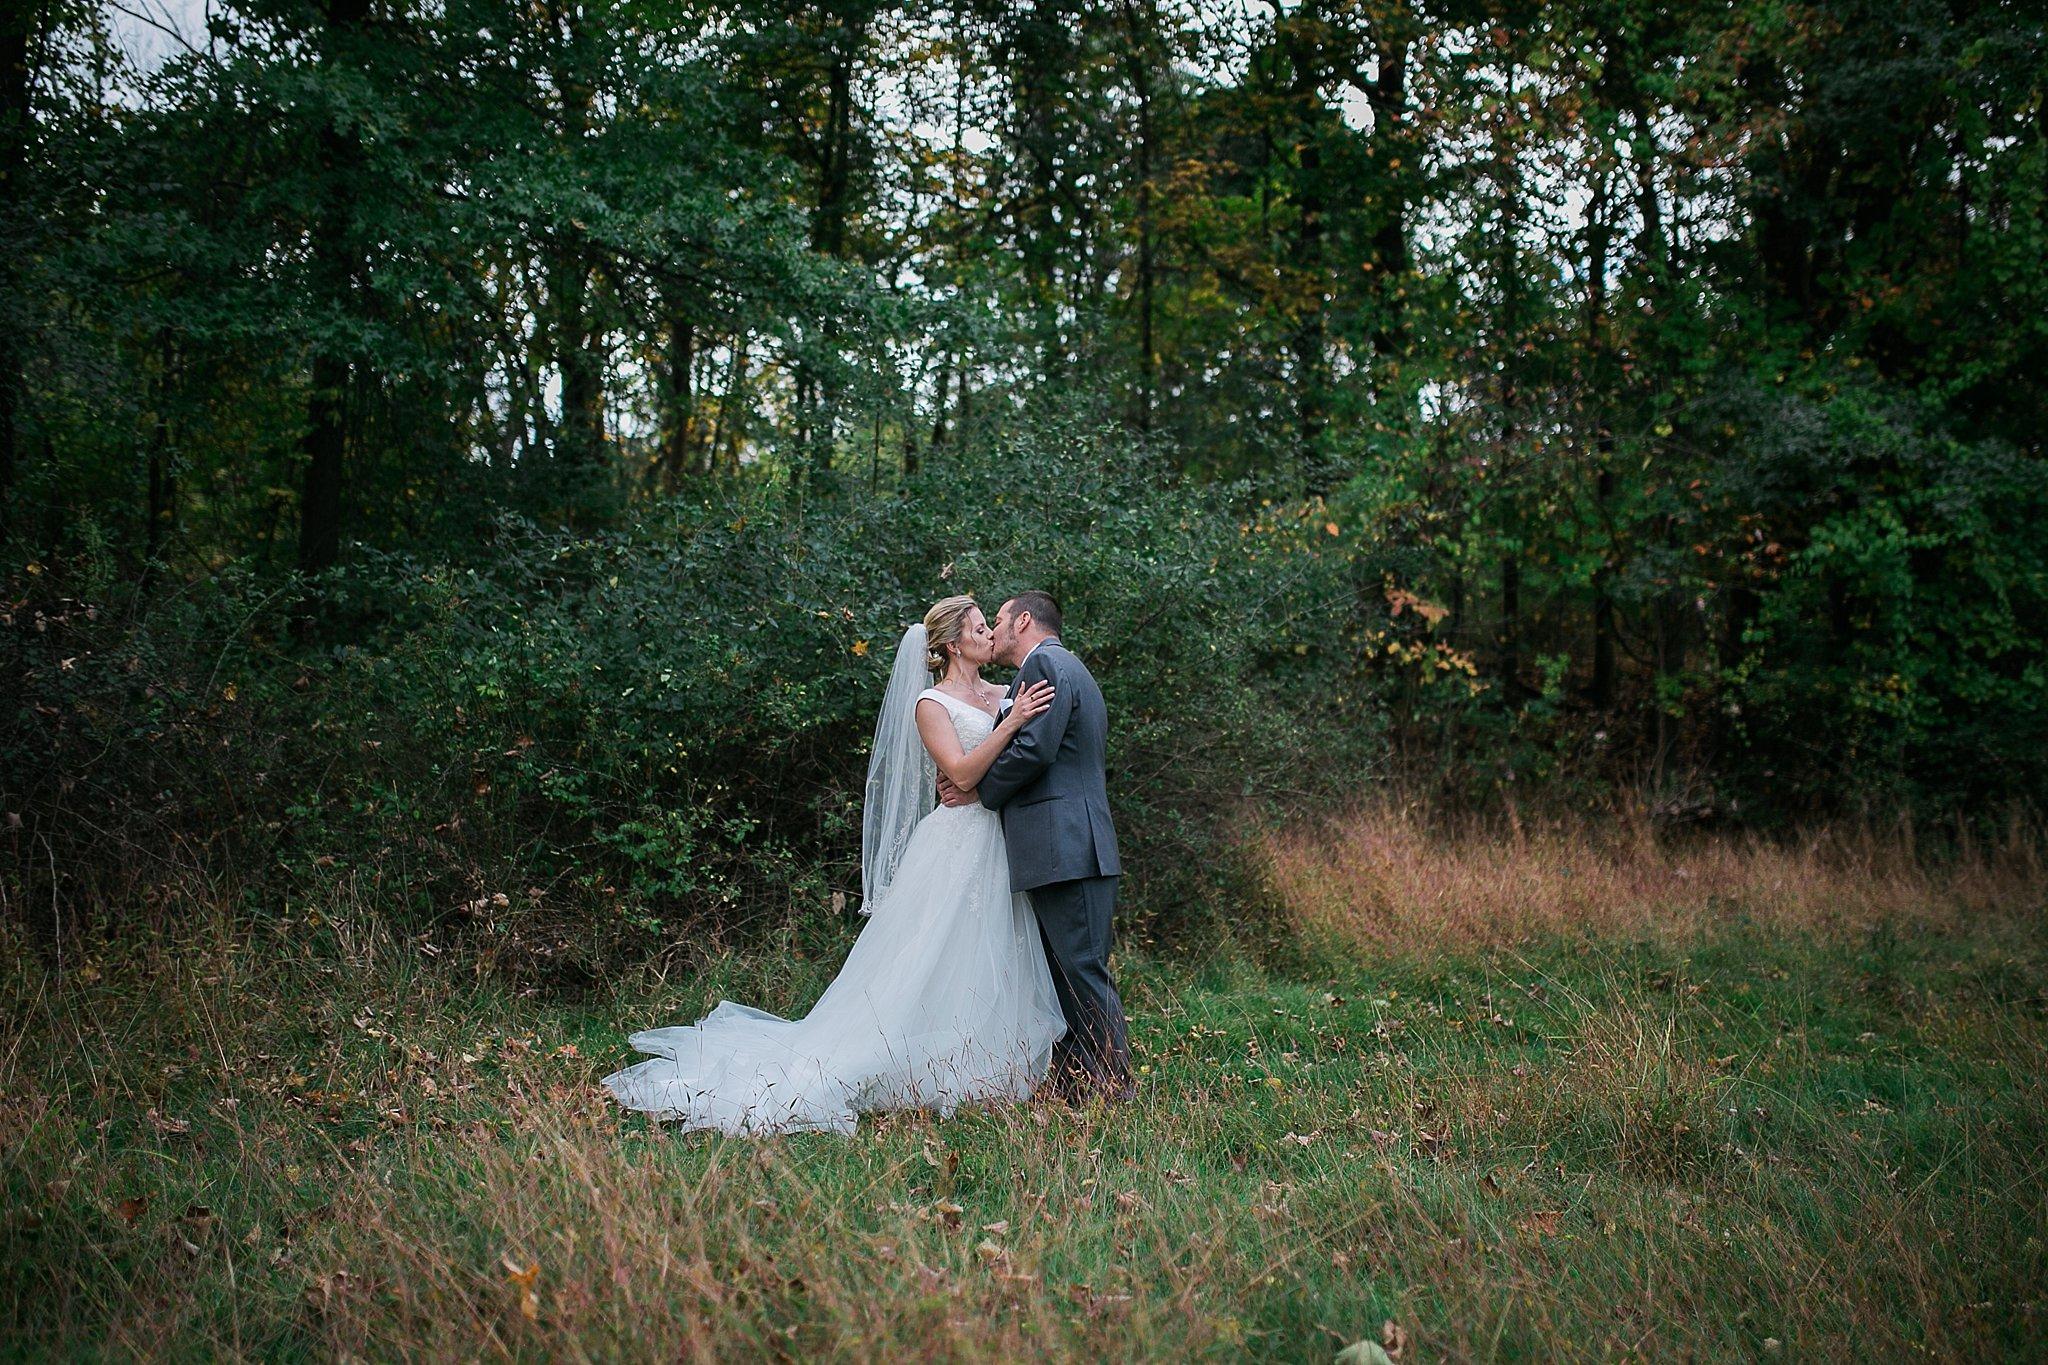 New Windsor New York Hudson Valley New York Wedding Photographer 23.jpg